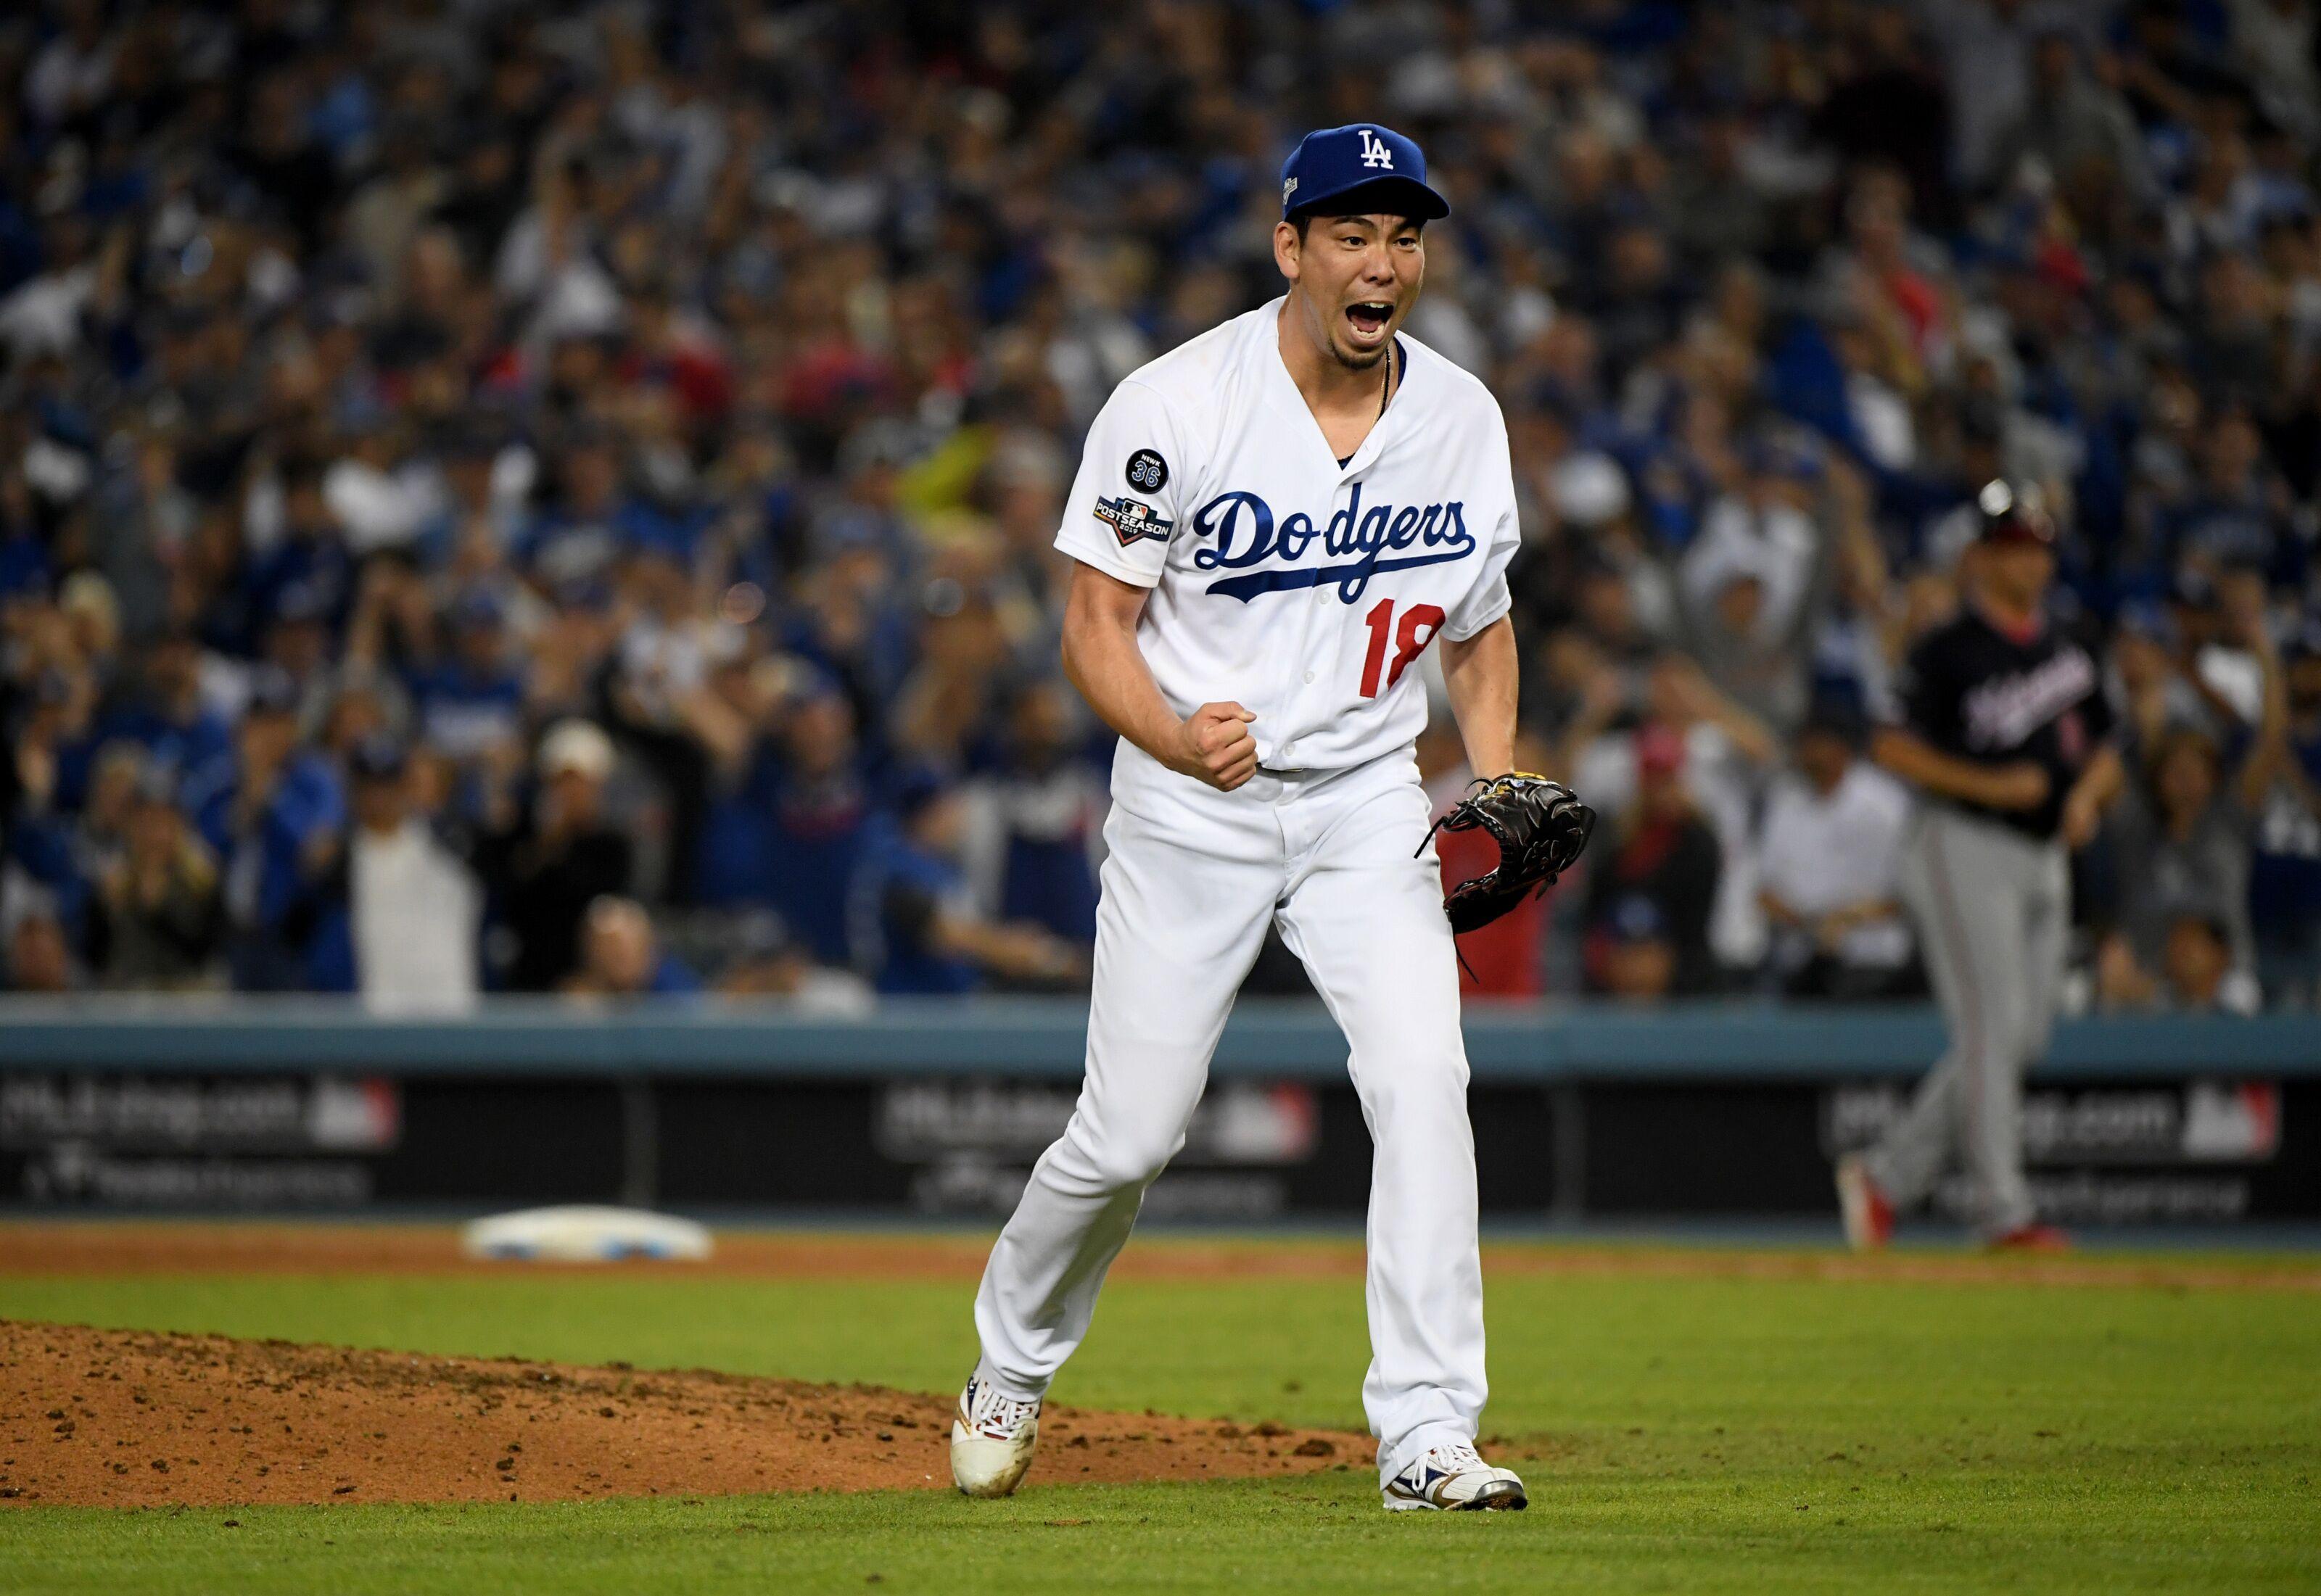 Los Angeles Dodgers: If Kenta Maeda gets traded, a superstar will follow